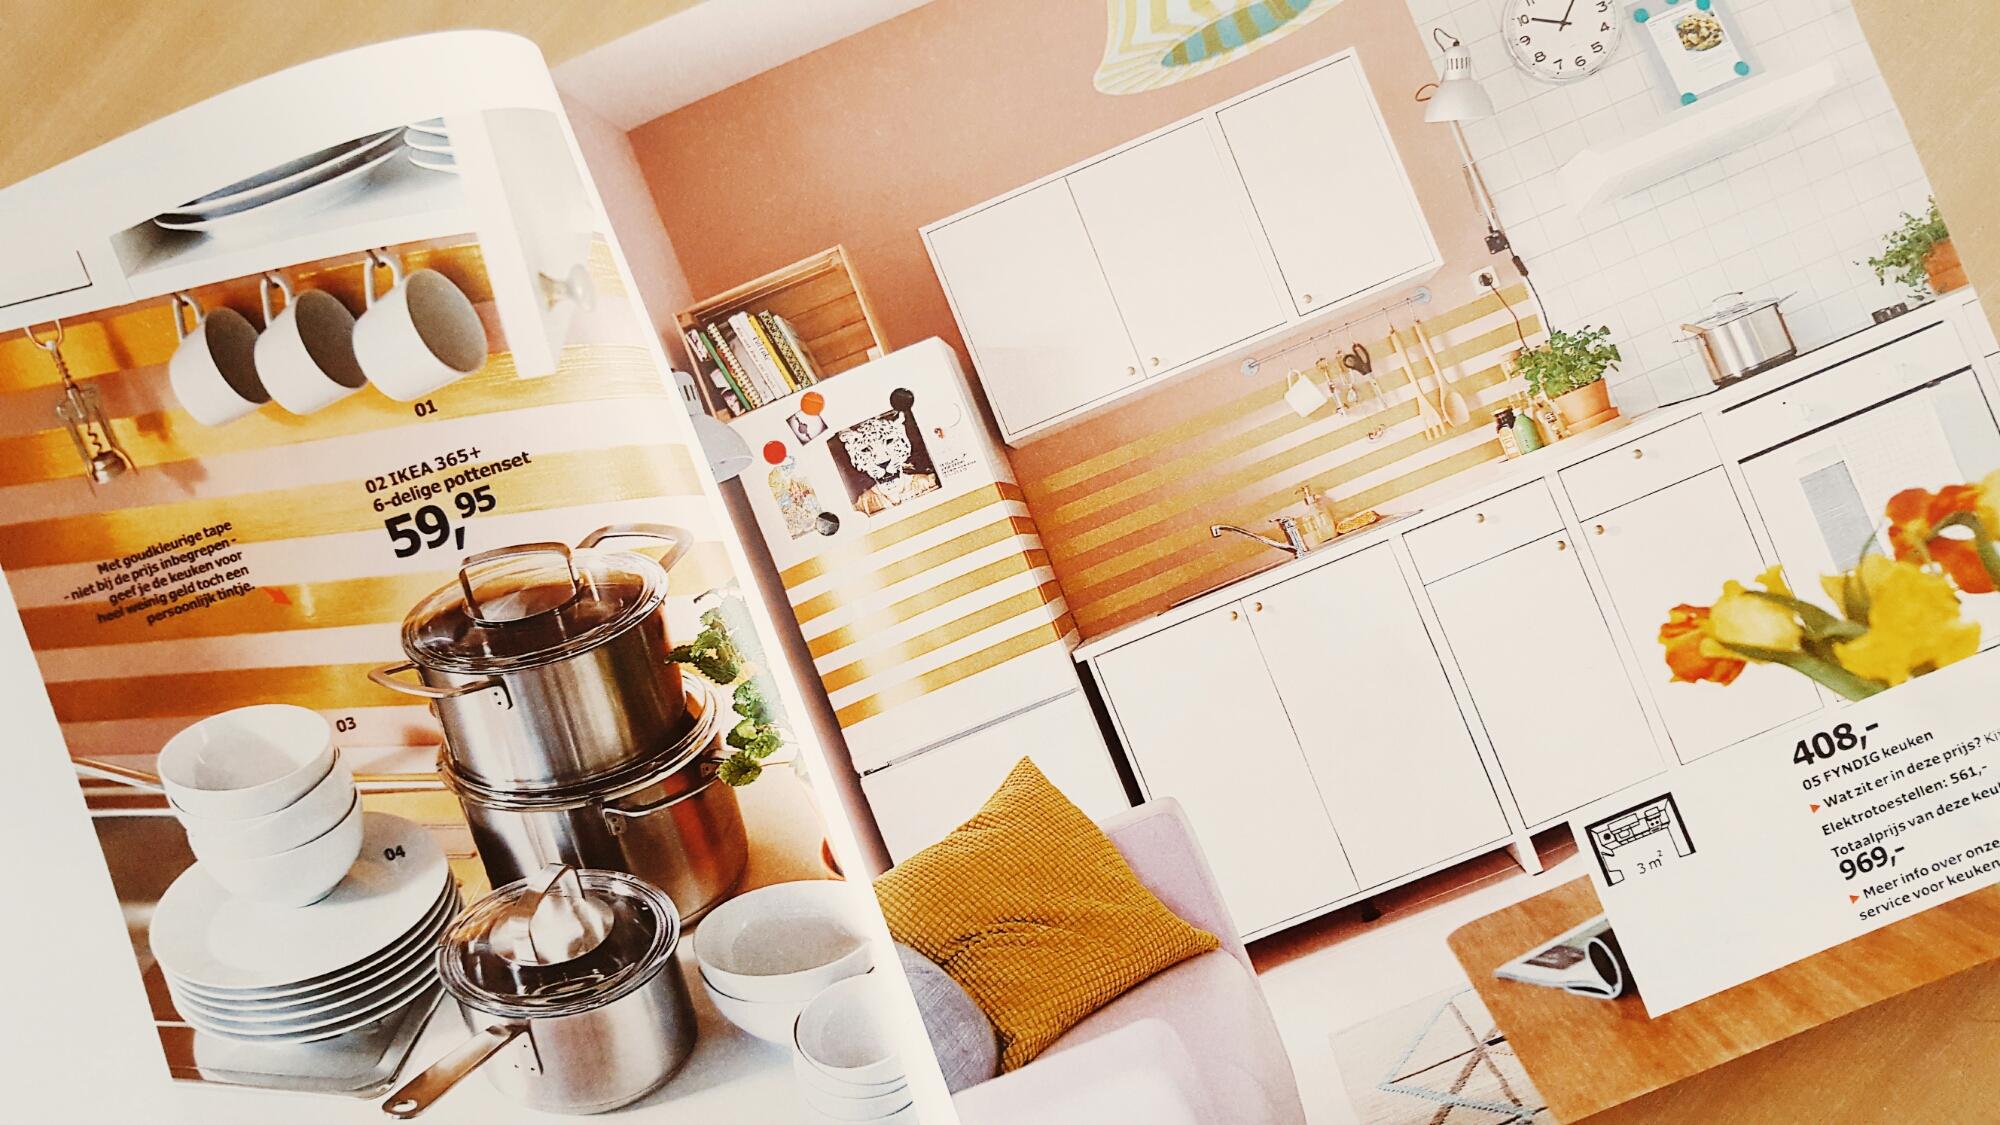 Keuken Catalogus Ikea : Inspi uit de ikea catalogus mamaexpert